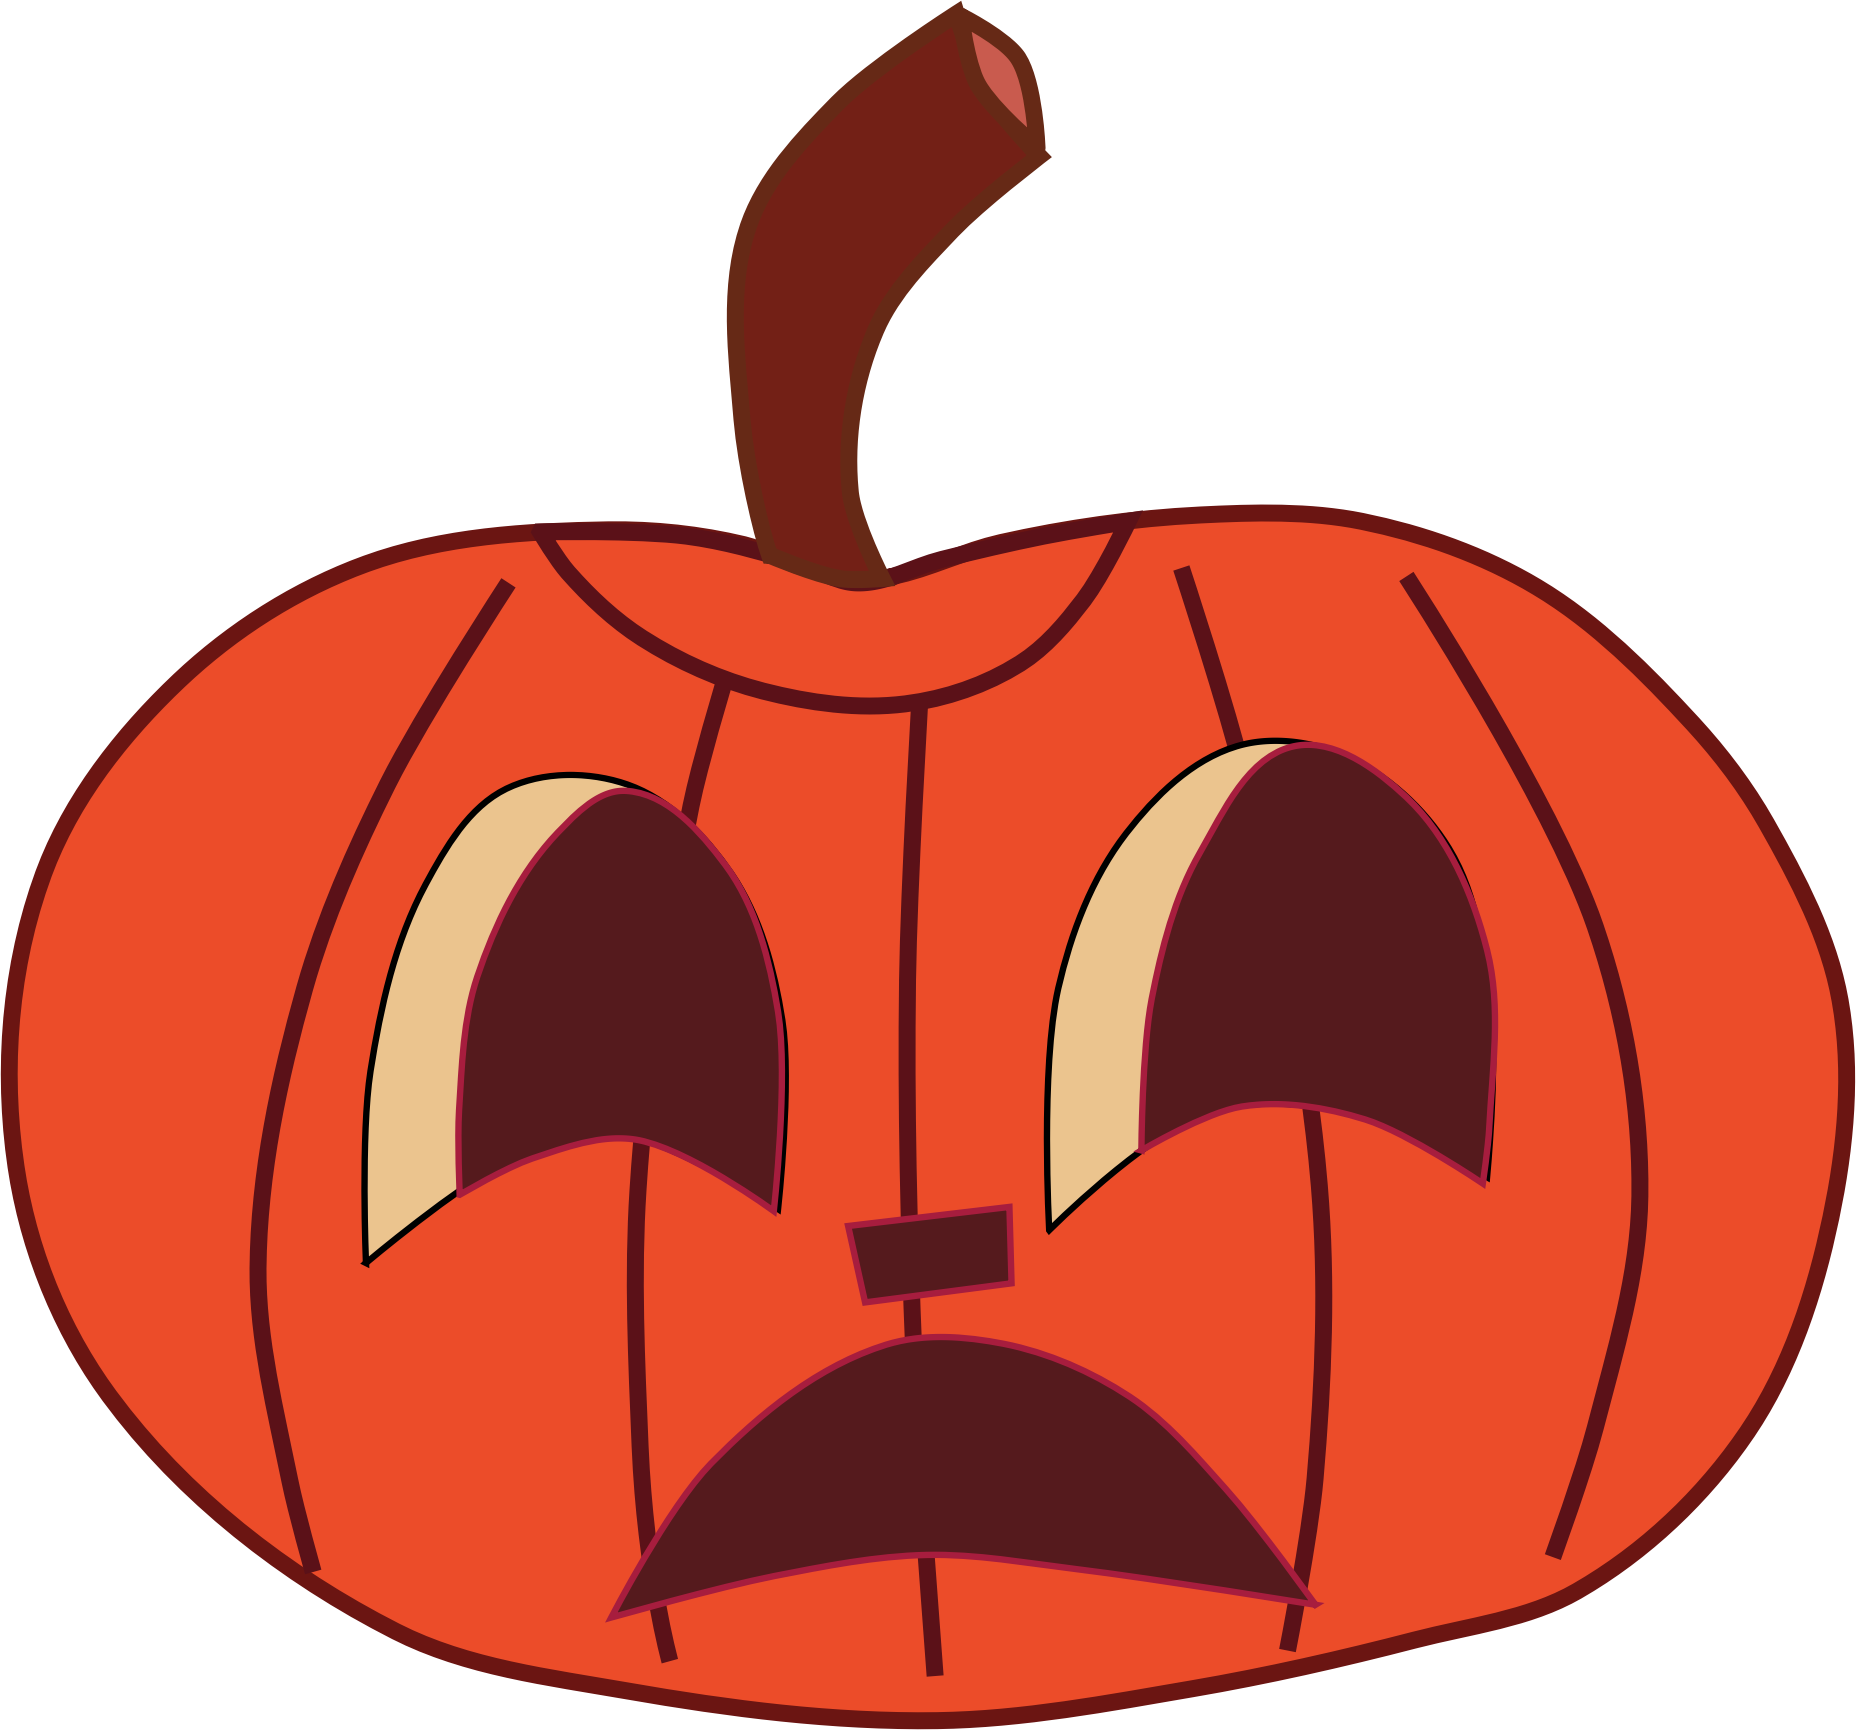 Halloween faces clip art. Mouth clipart pumpkin